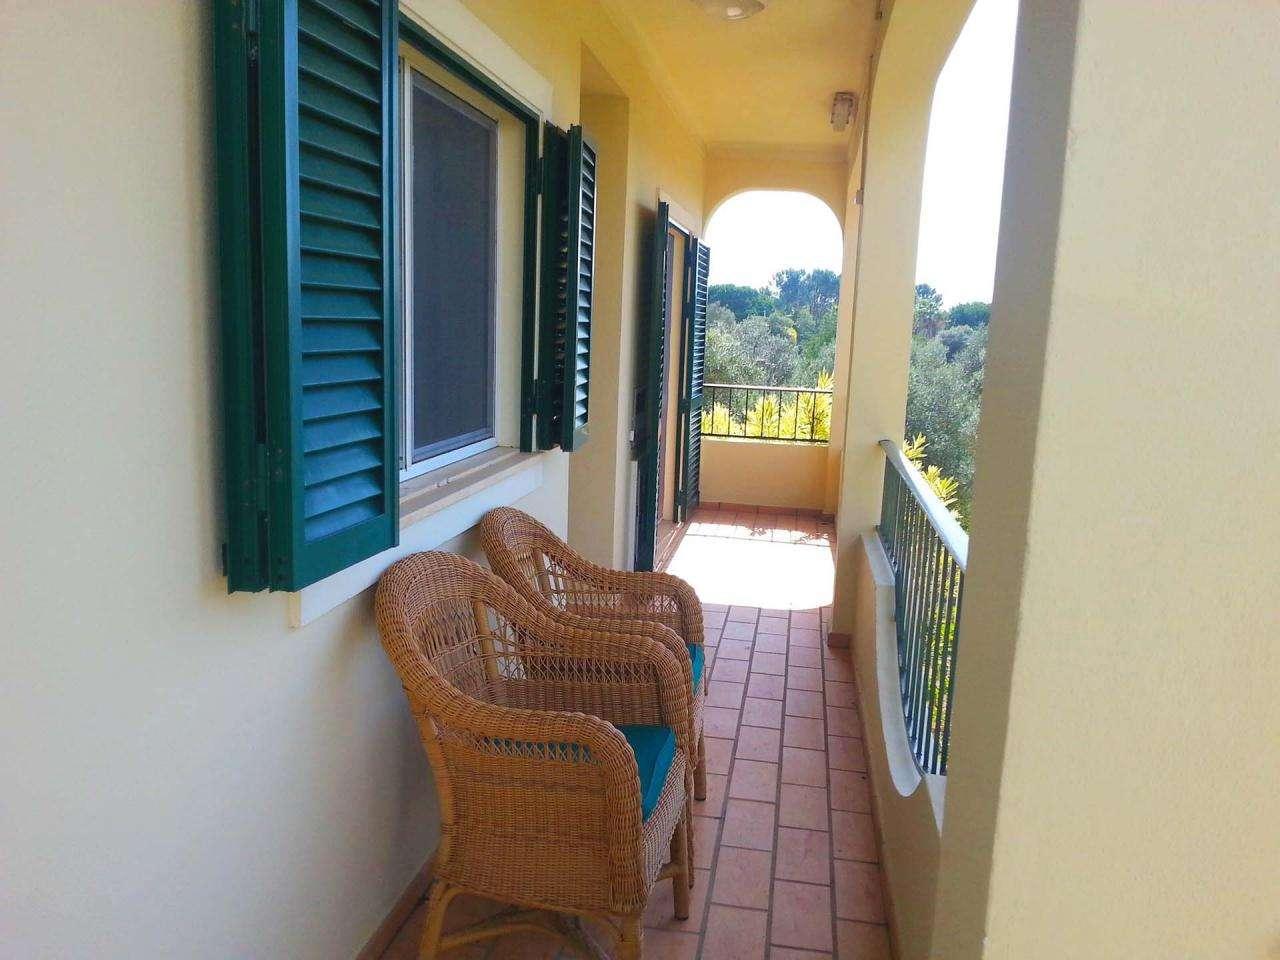 Apartamento para comprar, Almancil, Faro - Foto 13